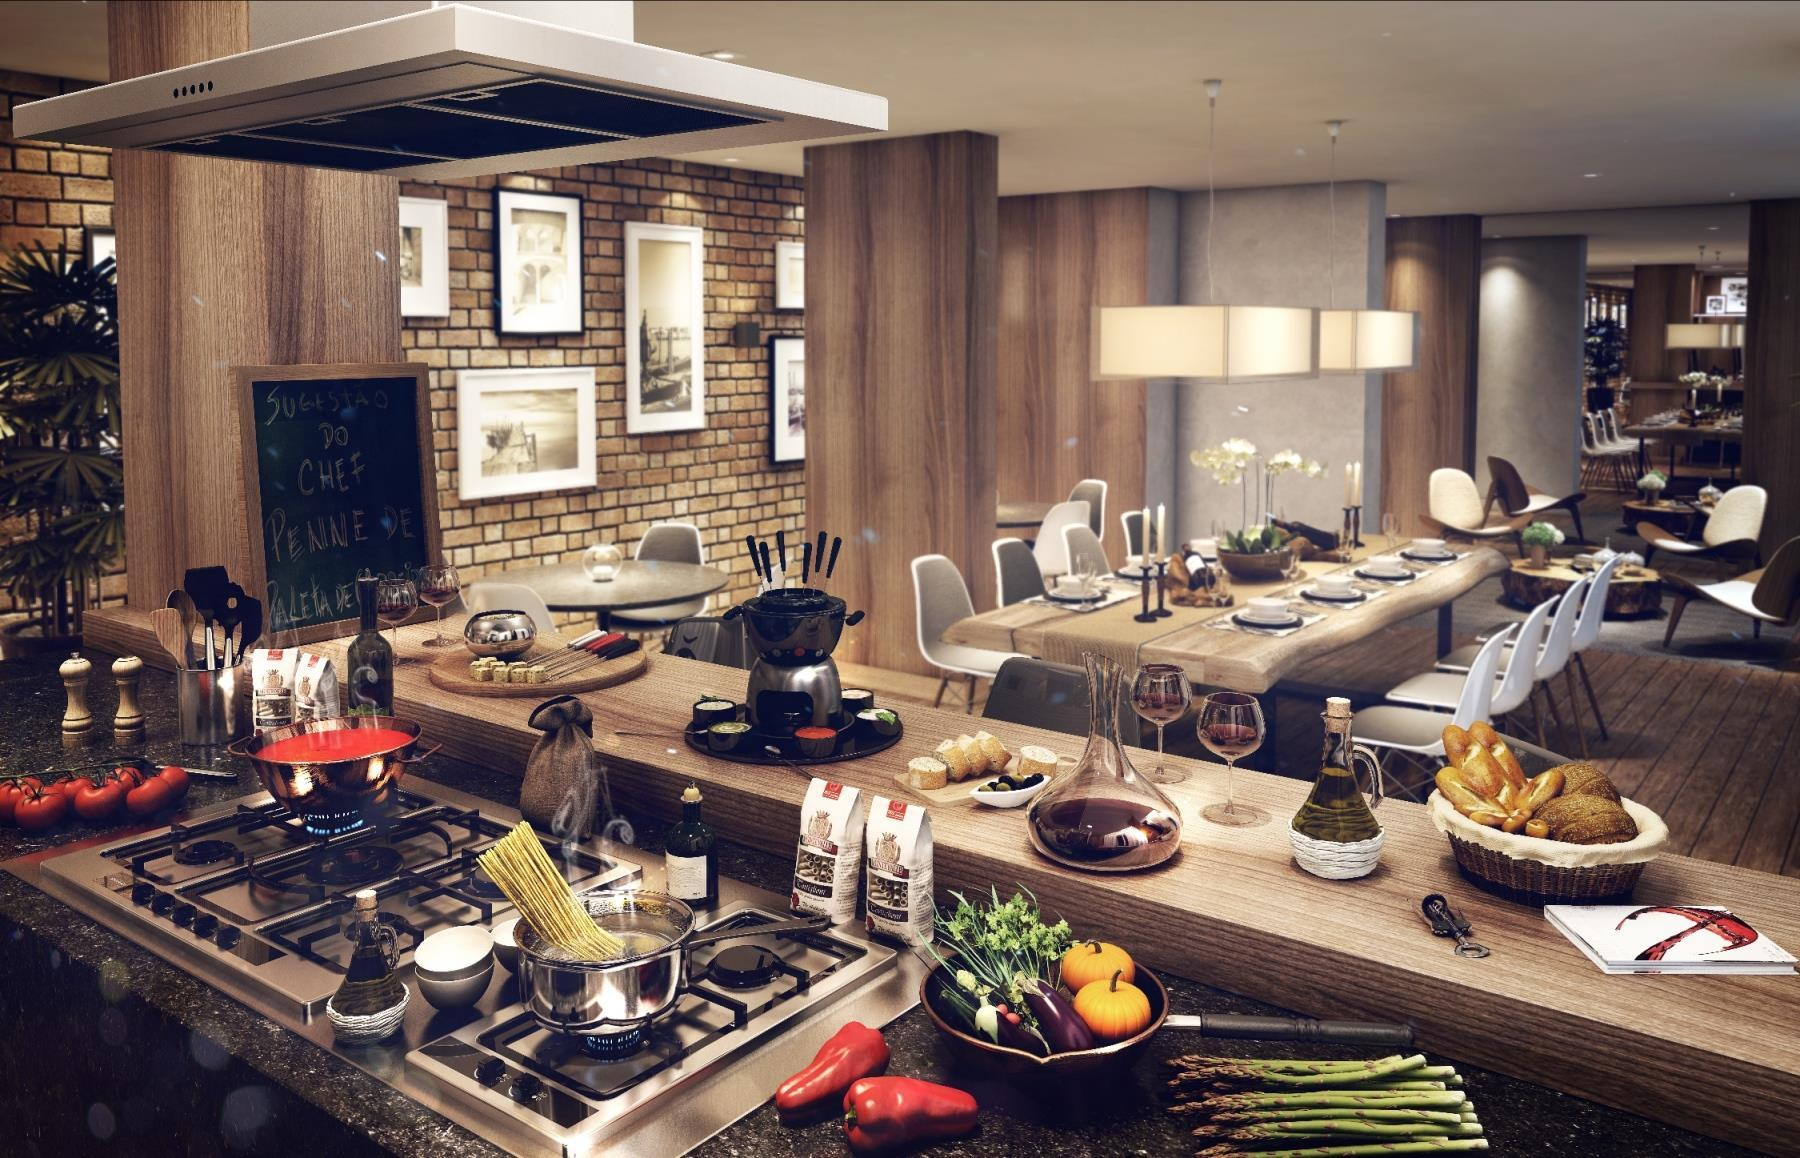 Perspectiva Ilustrada: Cozinha do Chef